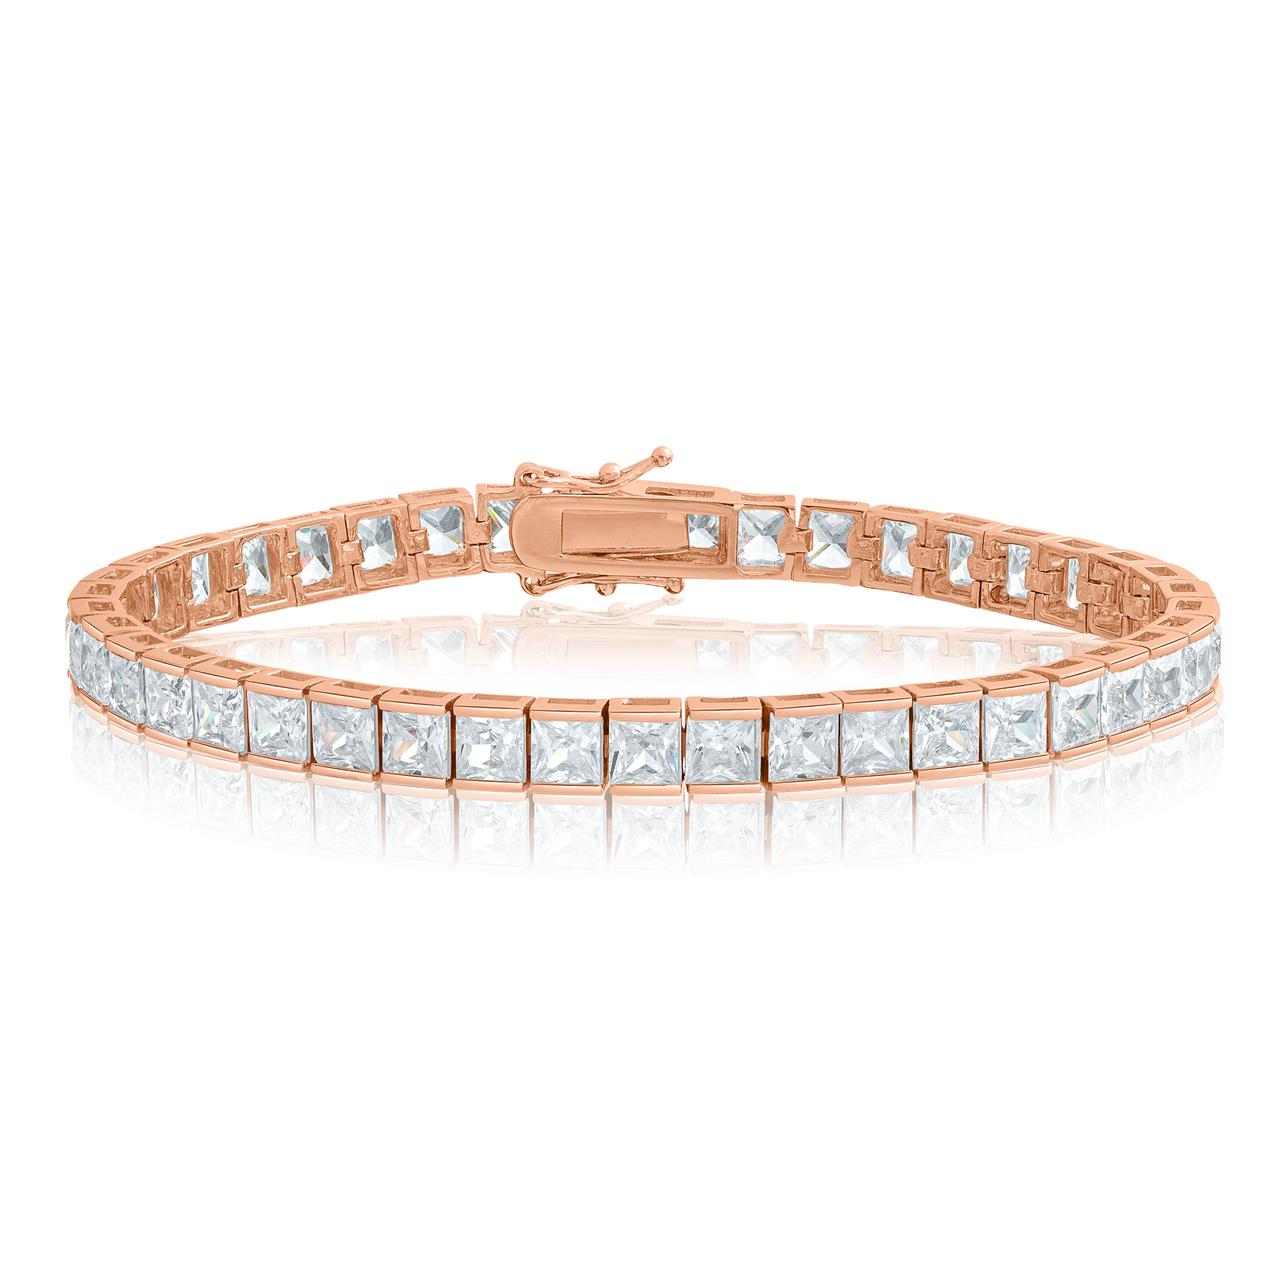 62cb62c1ed017 Cubic Zirconia Tennis Bracelet Rose Gold Plated 4x4mm Square White CZ